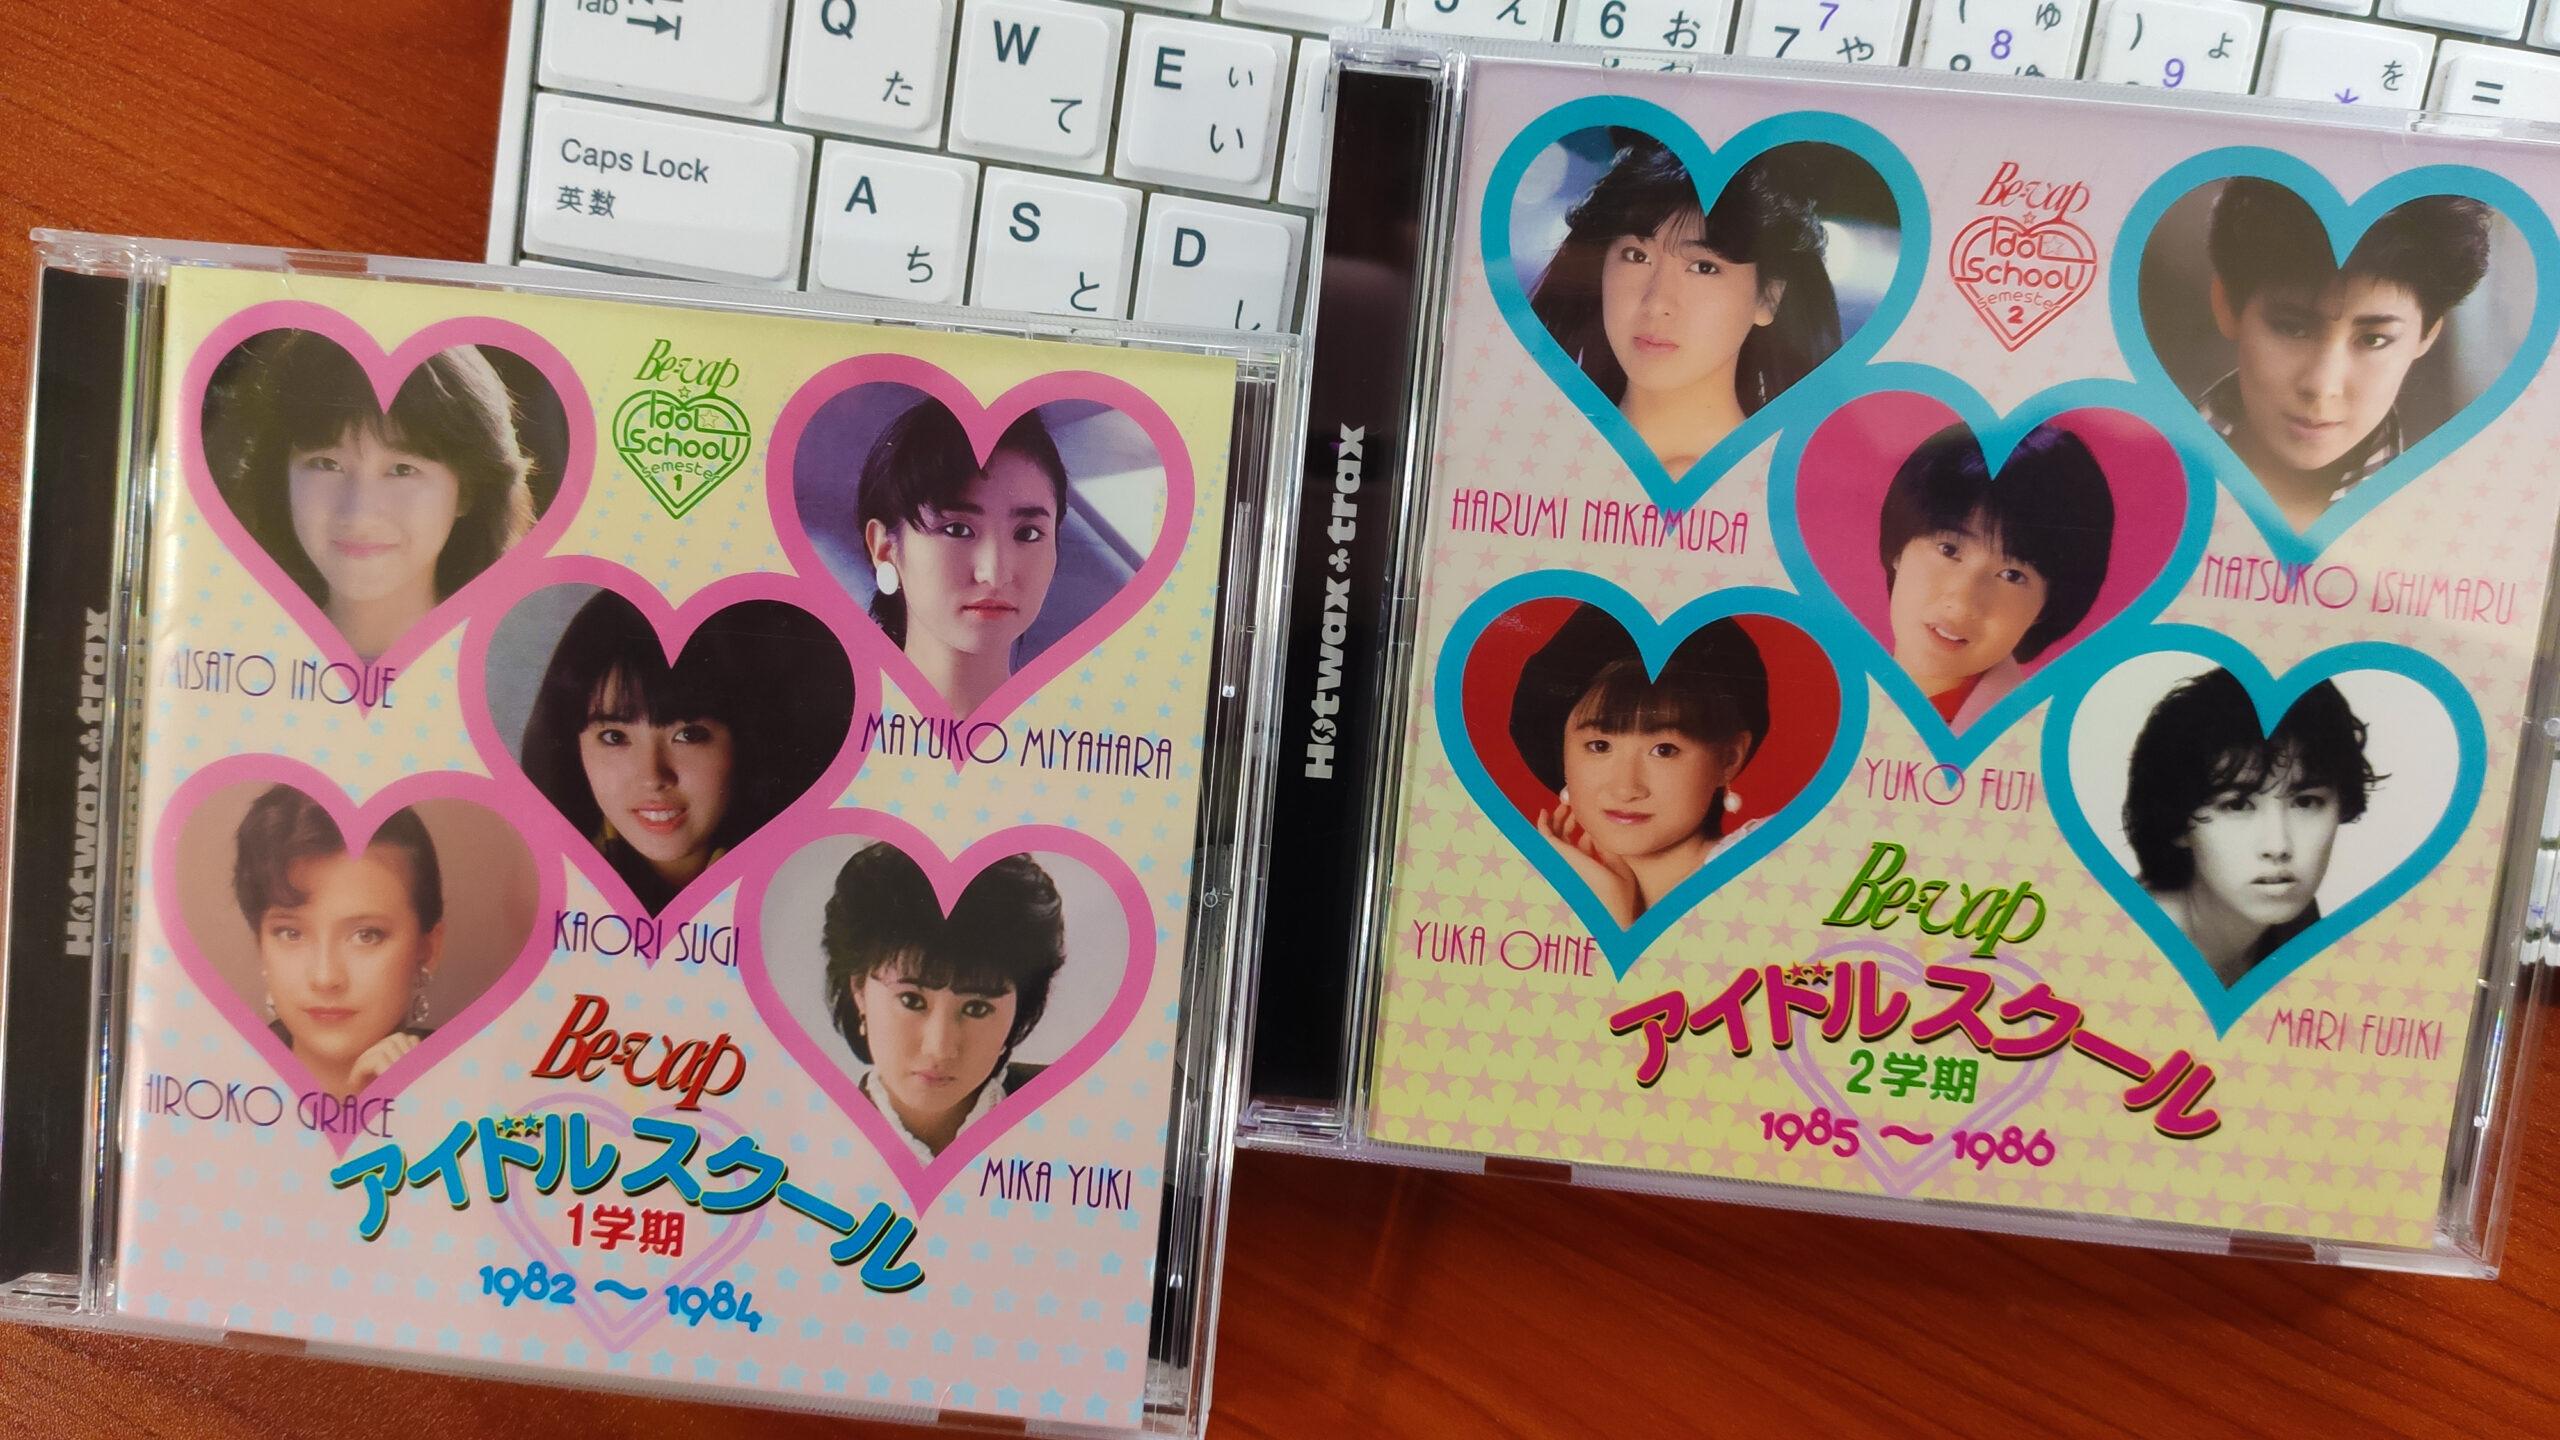 Be-vap Idol School アイドルスクール <1,2学期>